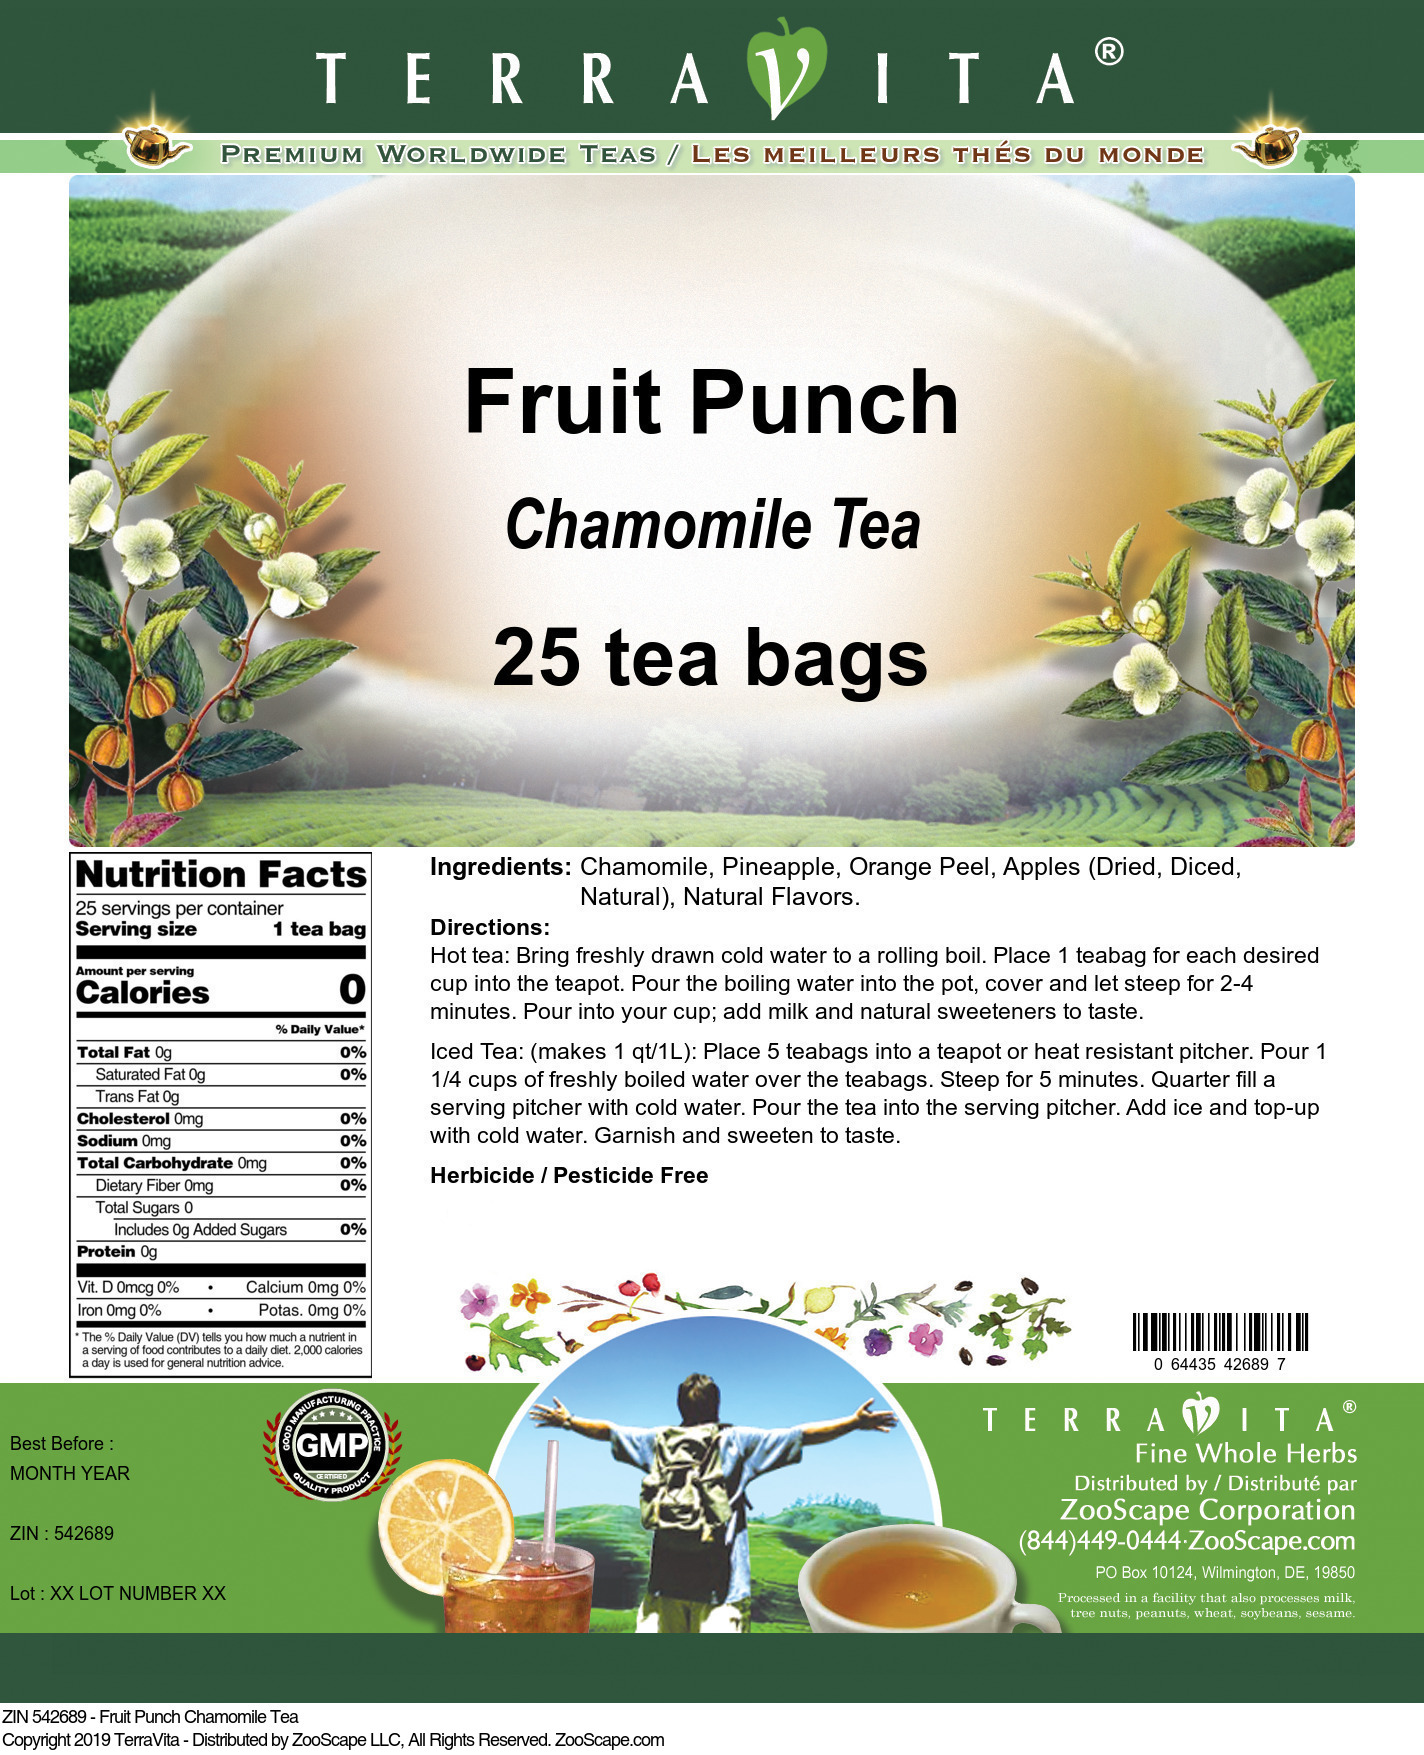 Fruit Punch Chamomile Tea